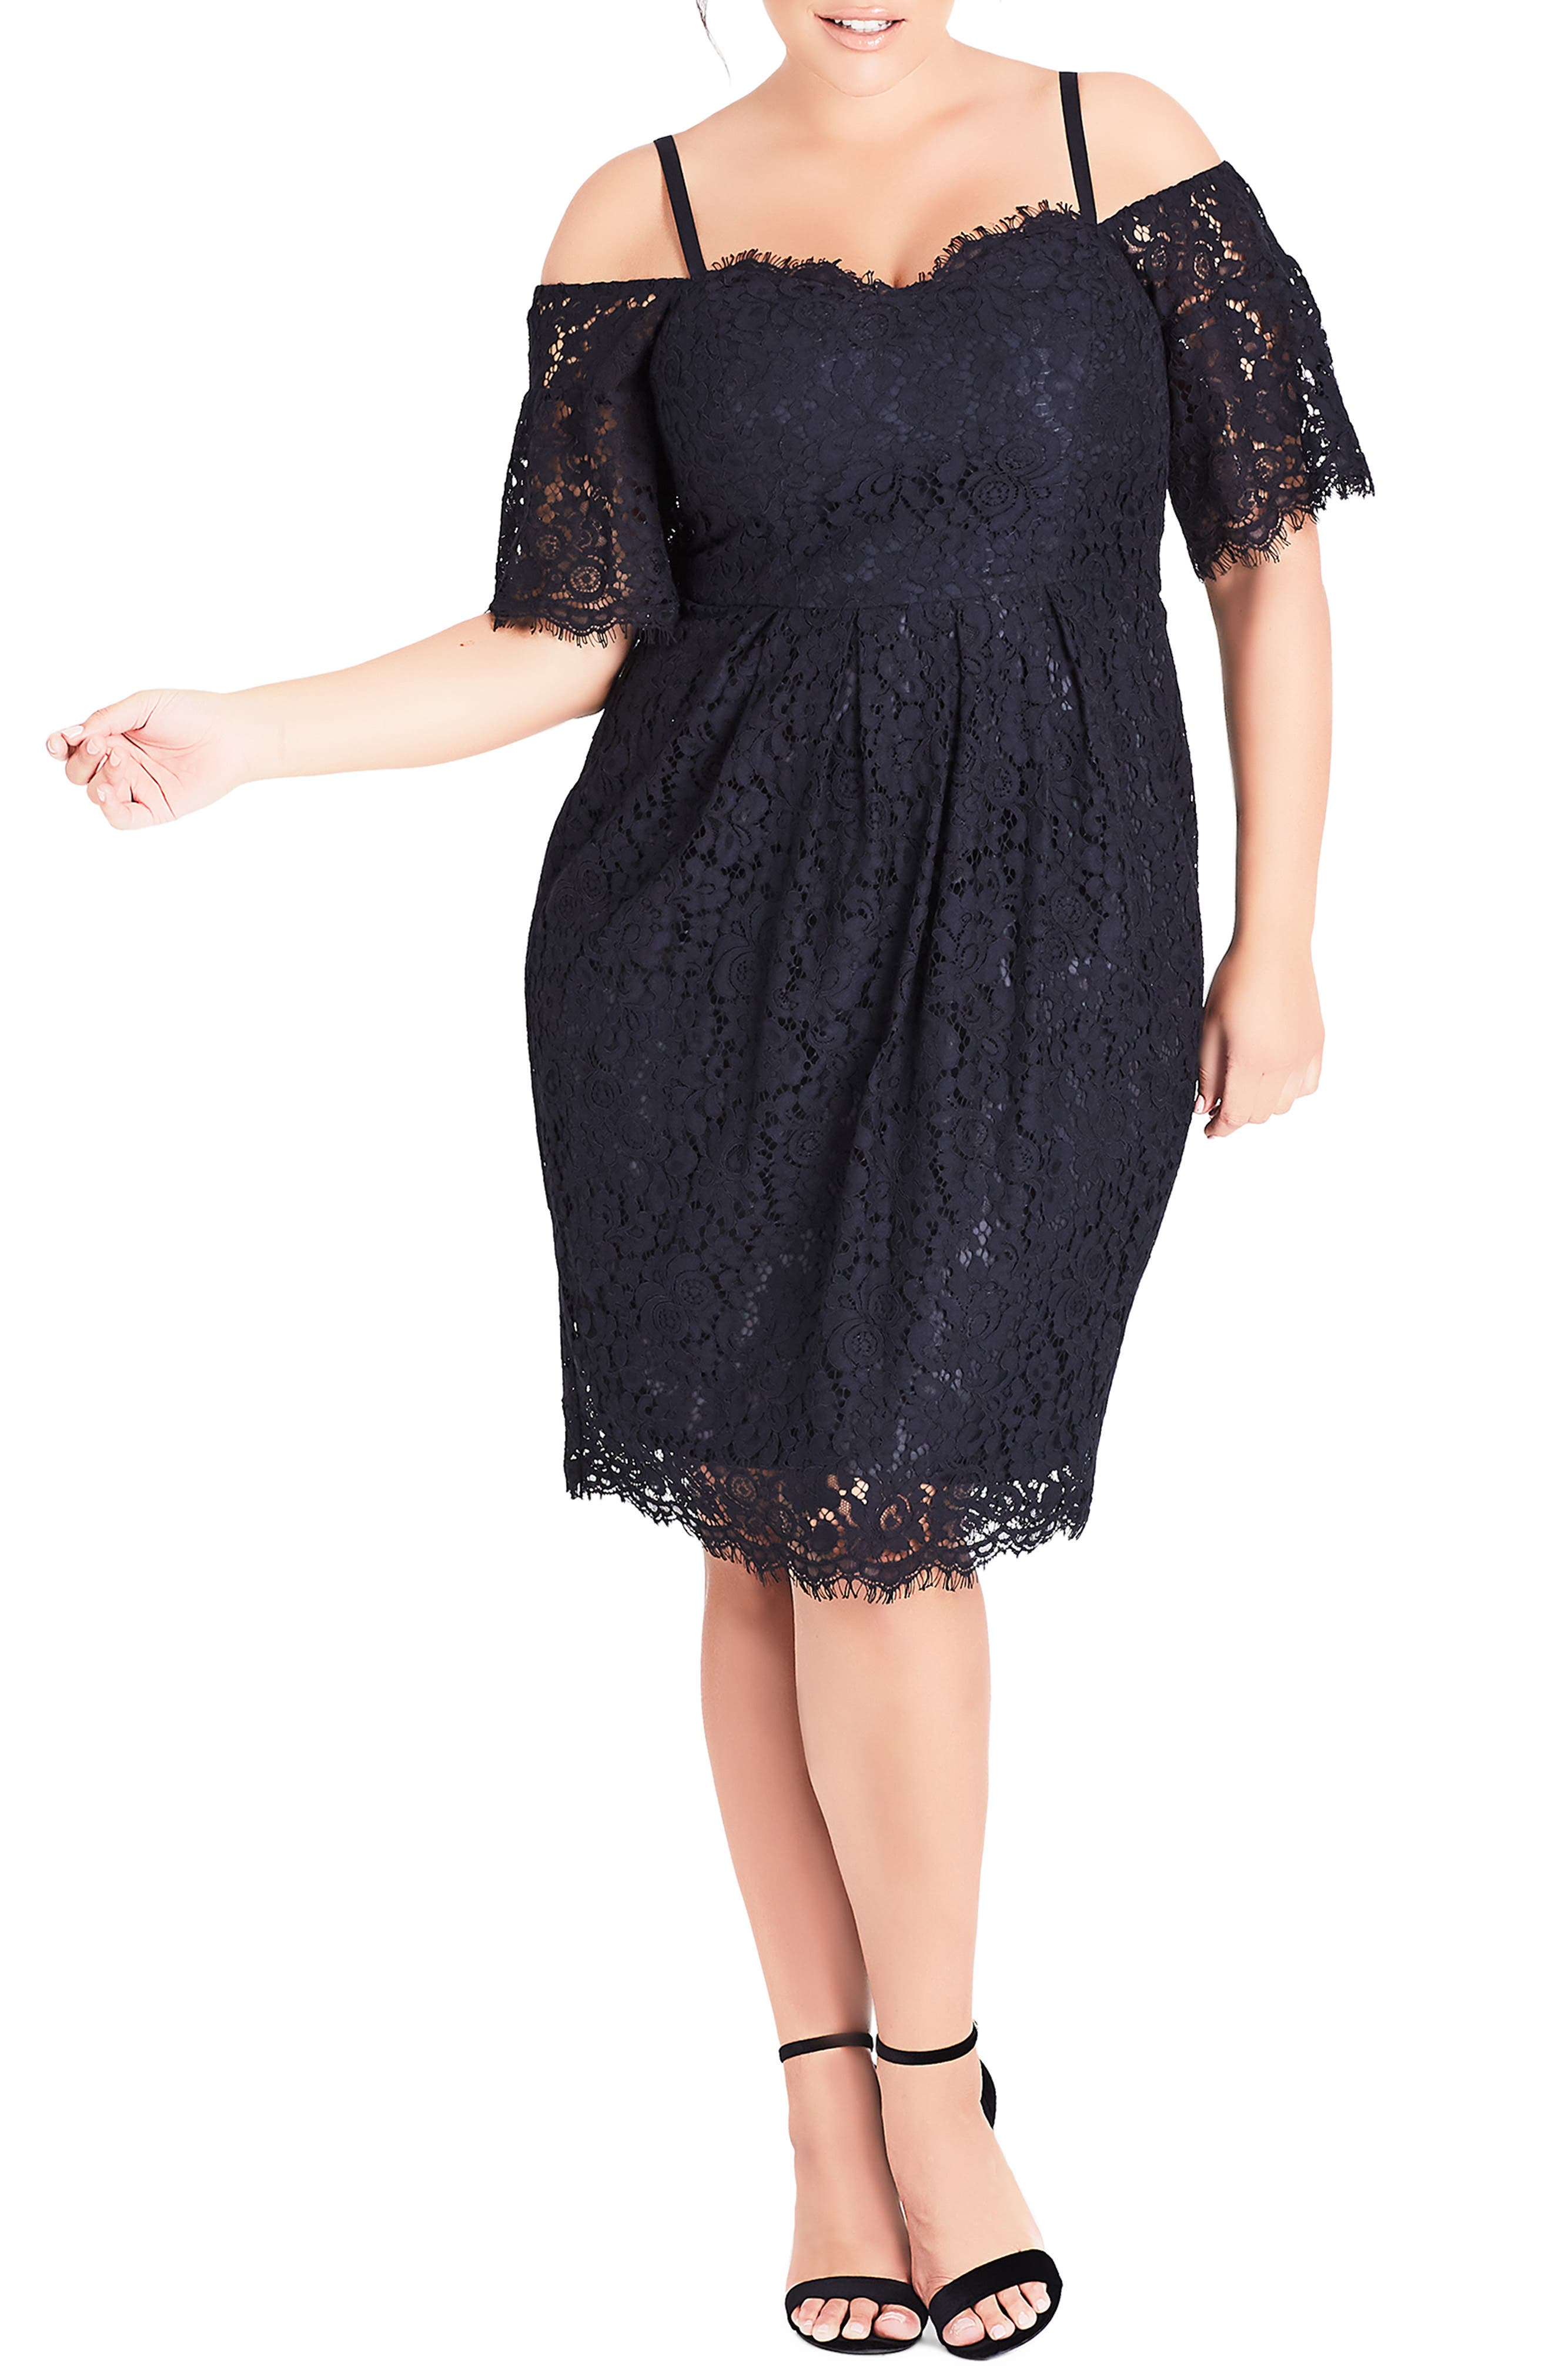 CITY CHIC Amour Cold Shoulder Lace Sheath Dress, Main, color, NAVY